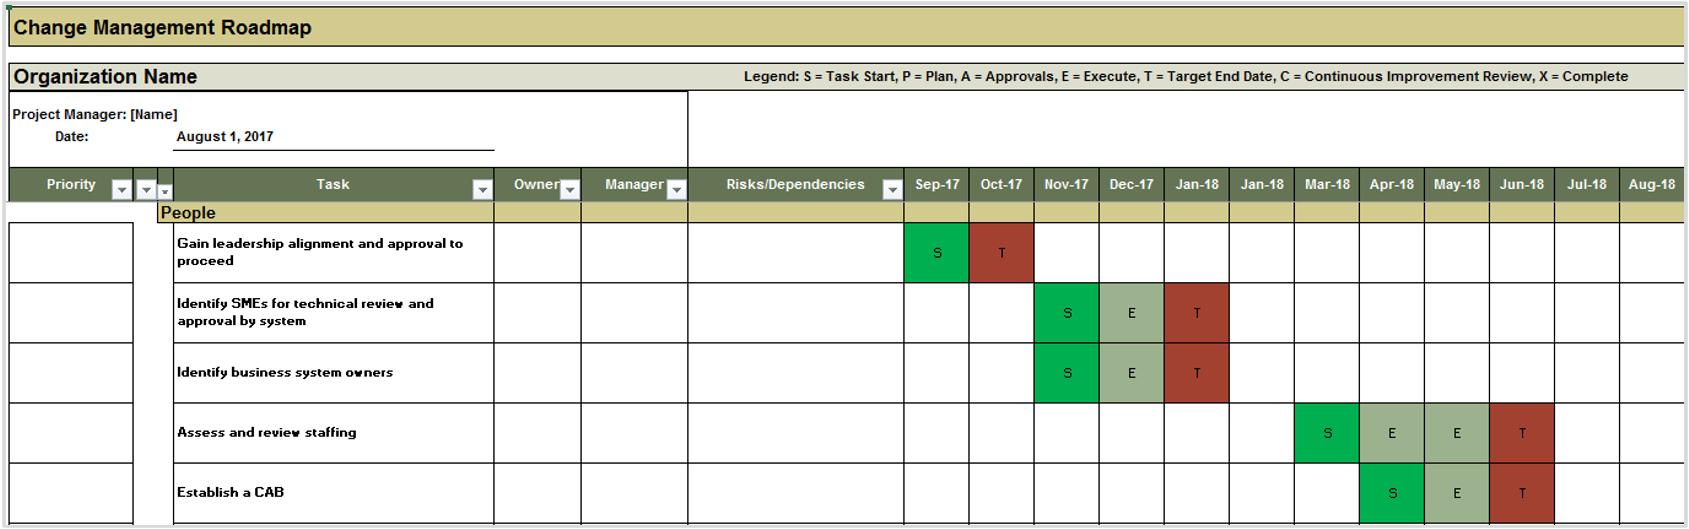 Screenshot of Info-Tech's Change Management Roadmap Tool